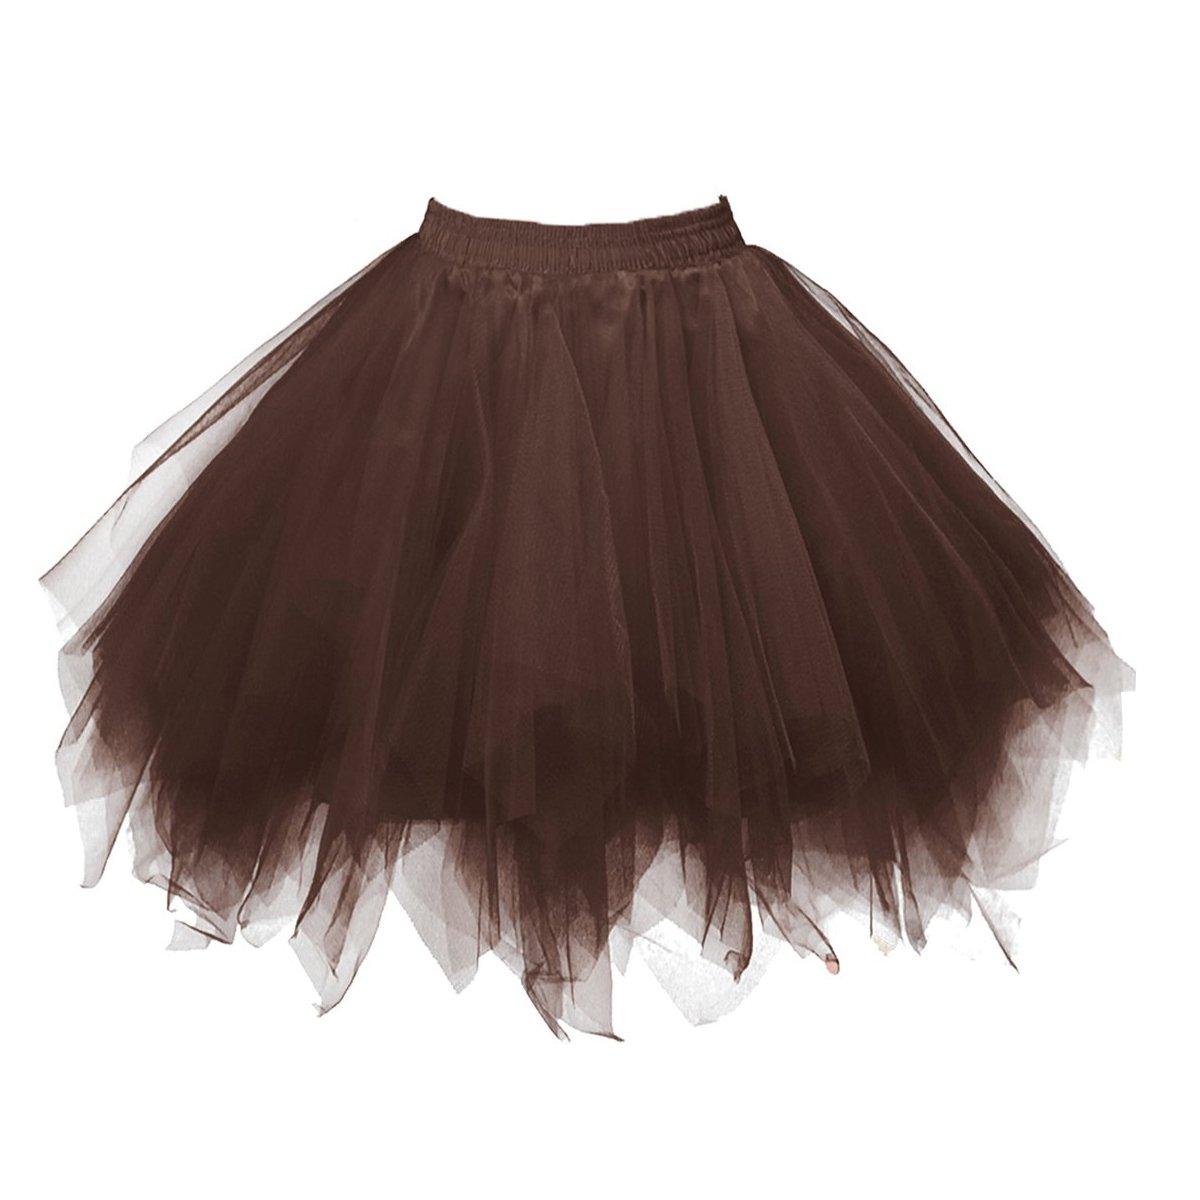 URVIP 80's Party Skirt Lolita Petticoat Vibrant Full Crinoline Layers Tulle Tutu U1806F1